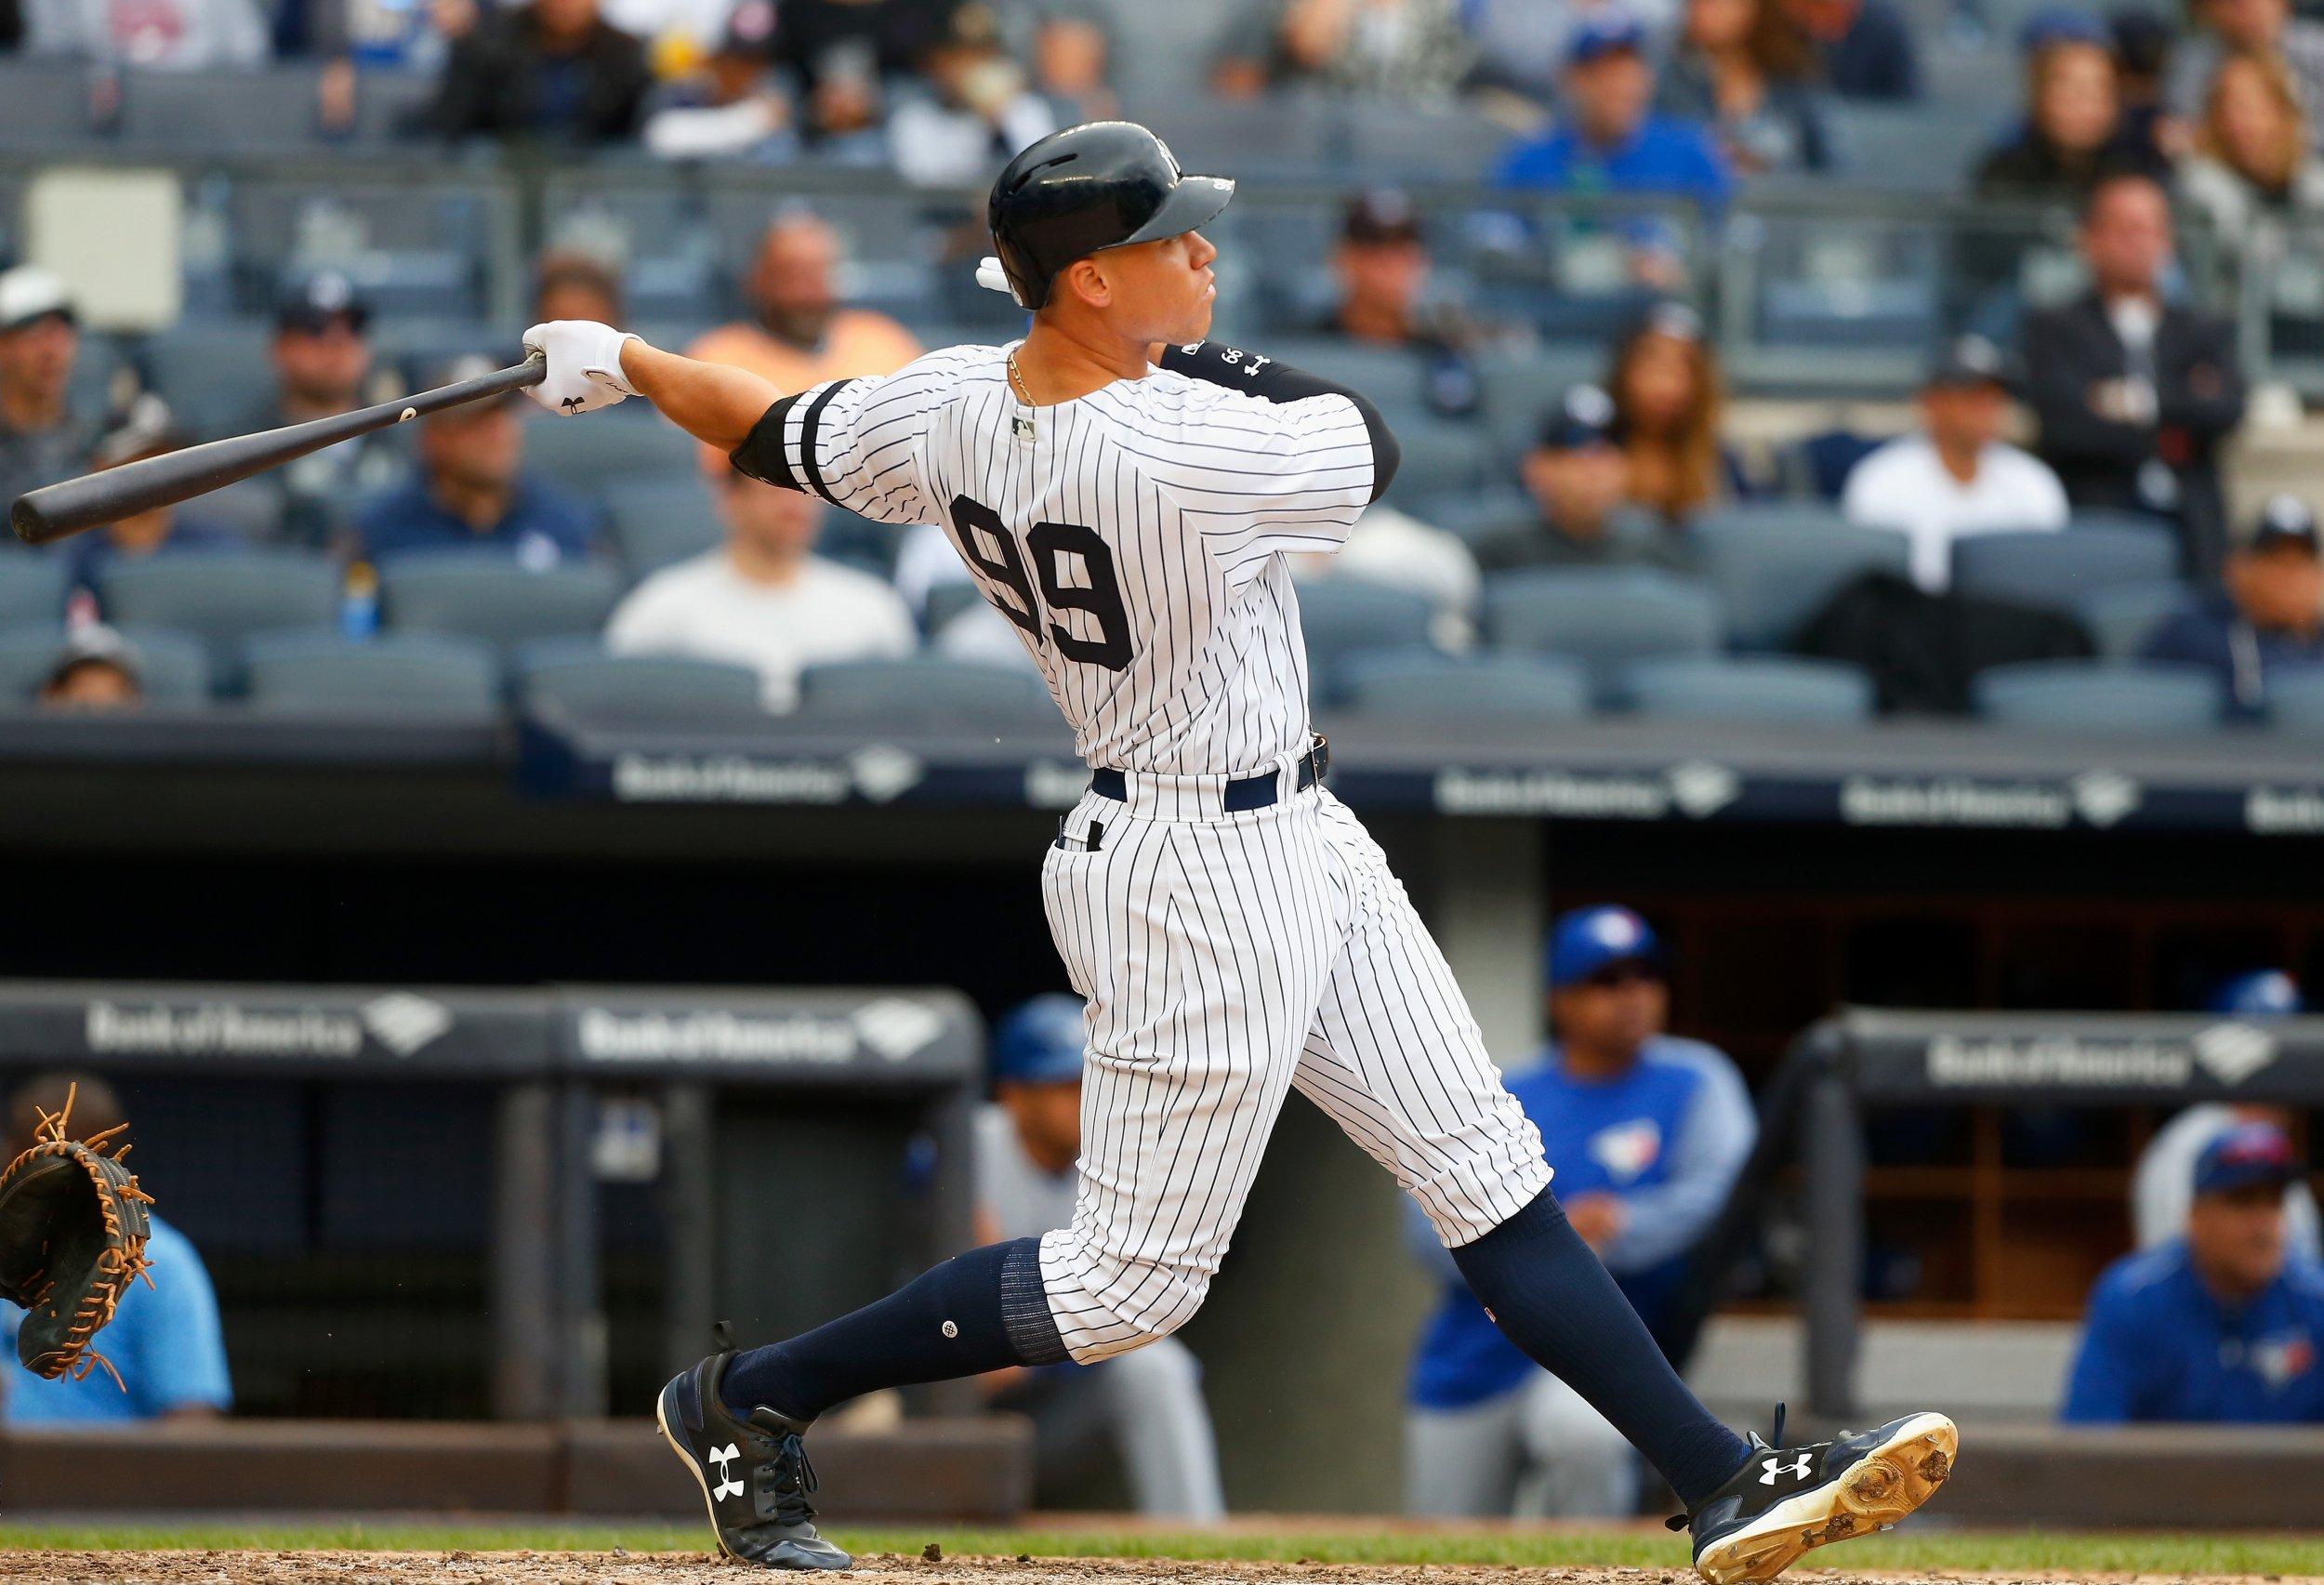 Aaron Judge of the New York Yankees at Yankee Stadium, New York City, September 30.